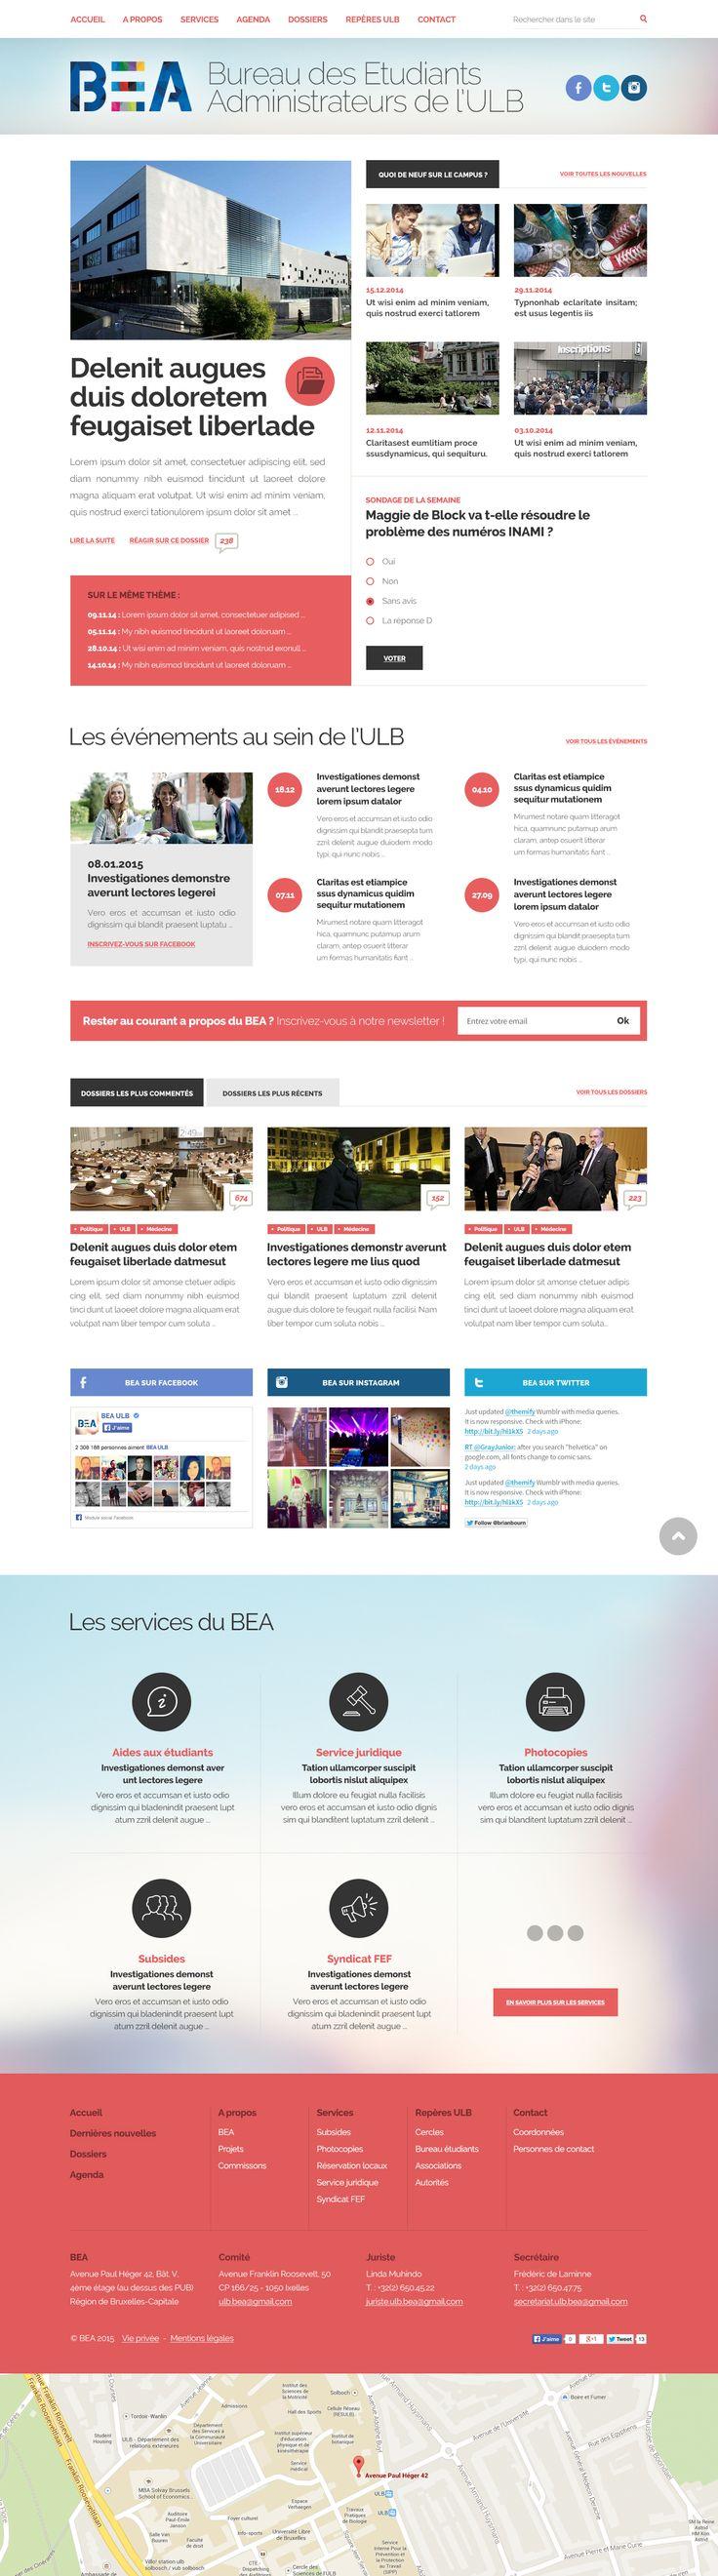 BEA Website #graphicdesign #webdesign #design #website #layout #responsive #uidesign #uxdesign #responsive #mirko #typography #mobileapplication #creativedesign MIRKO *L* Graphic Designer in Brussels - www.cerasuolo.org/